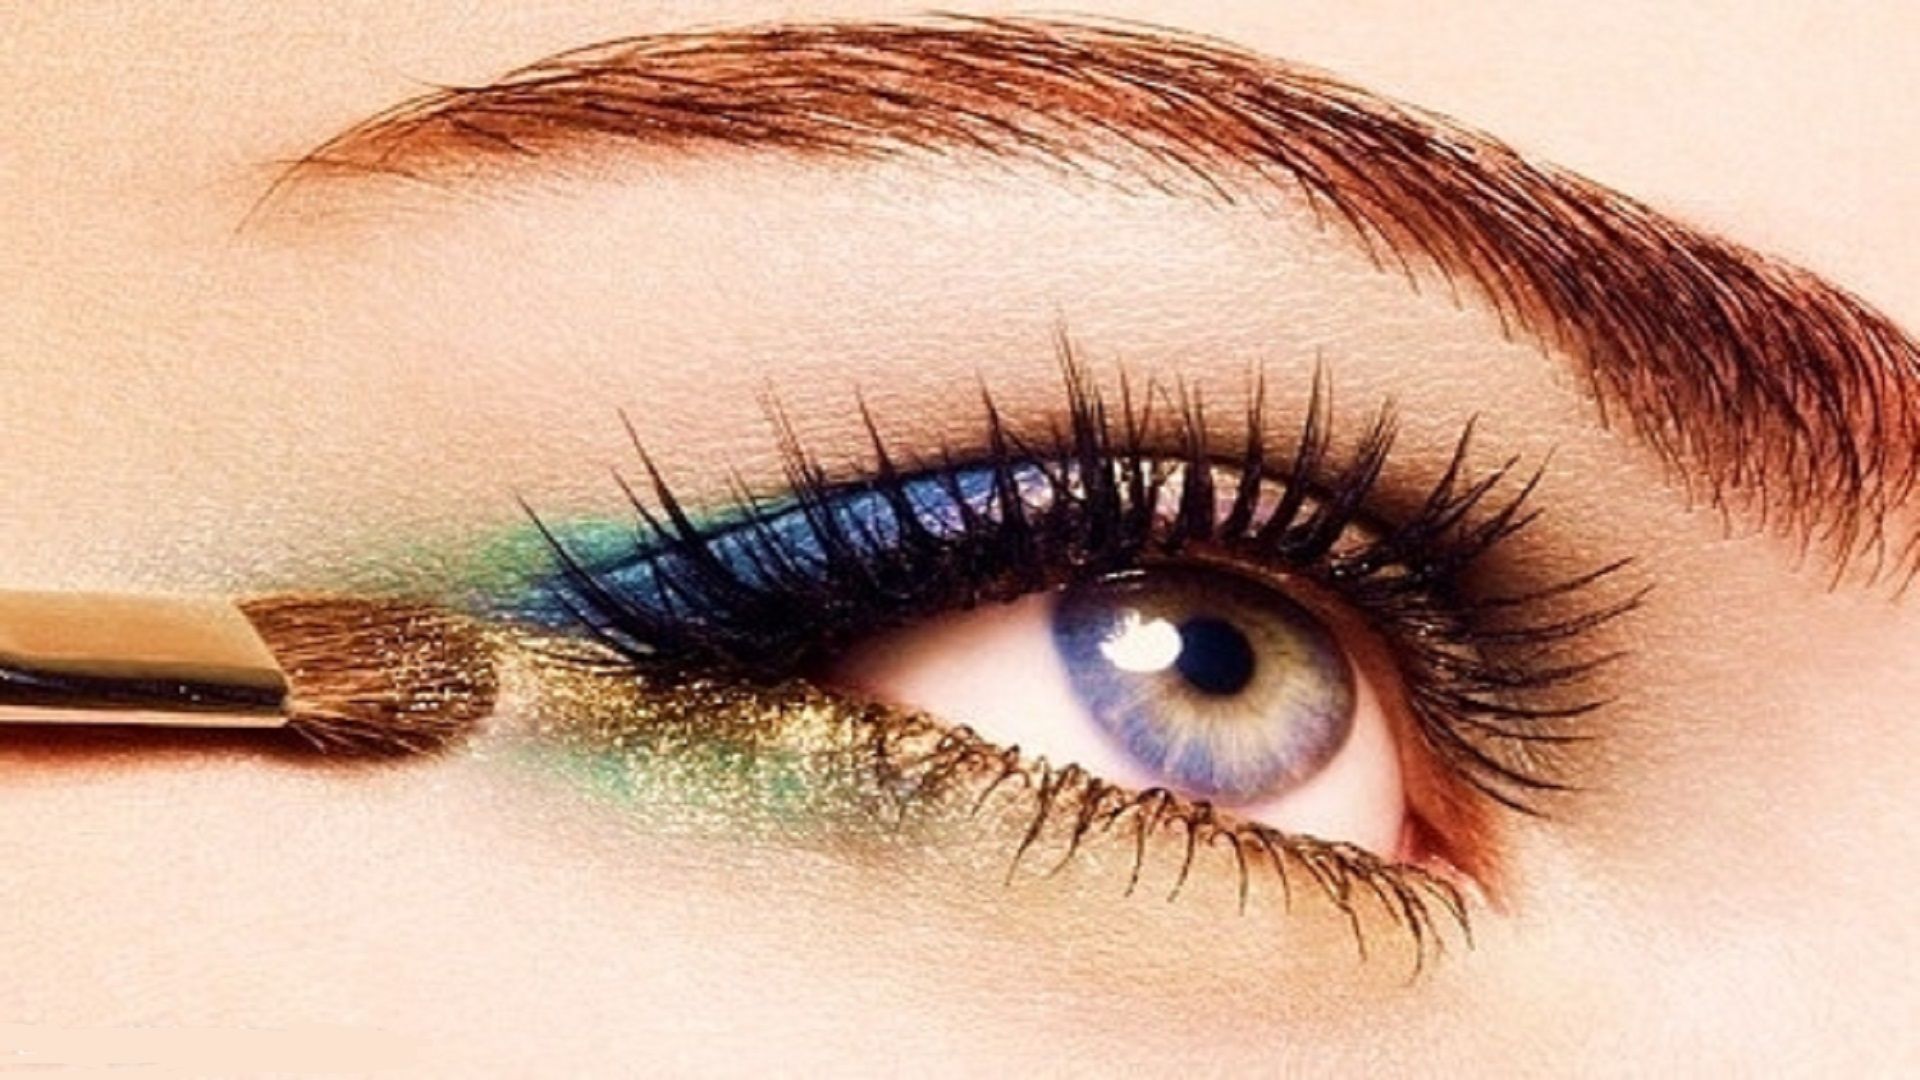 26464-Beautiful-Eye-Makeup-hd-free-wallpapers